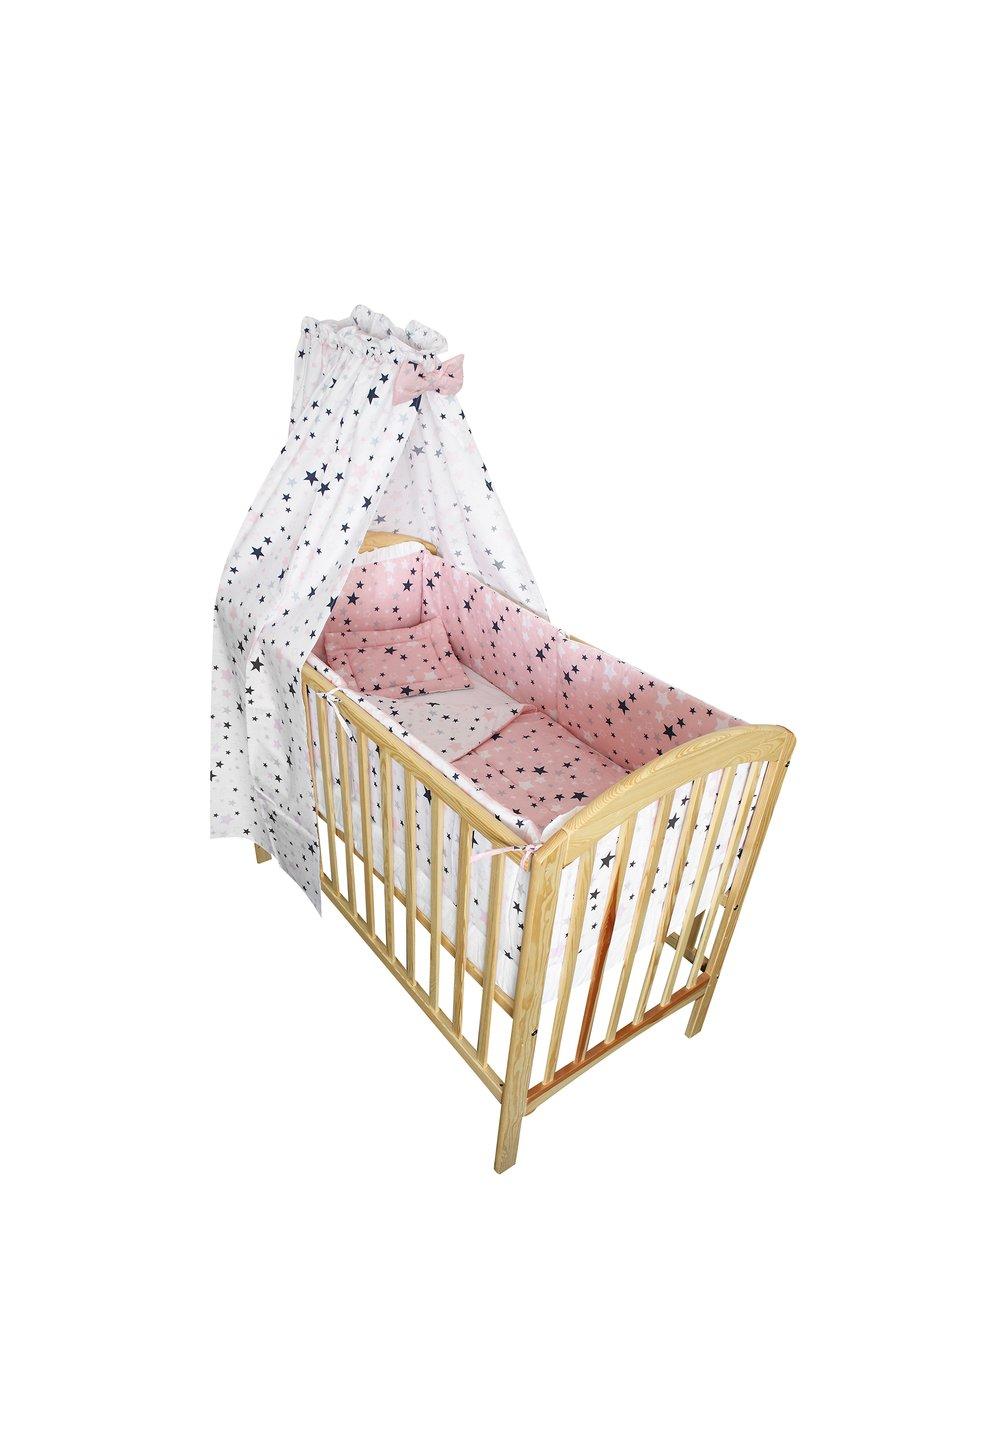 Lenjerie cu baldachin, 2 fete, stelutele roz 1, 120 x 60 cm imagine